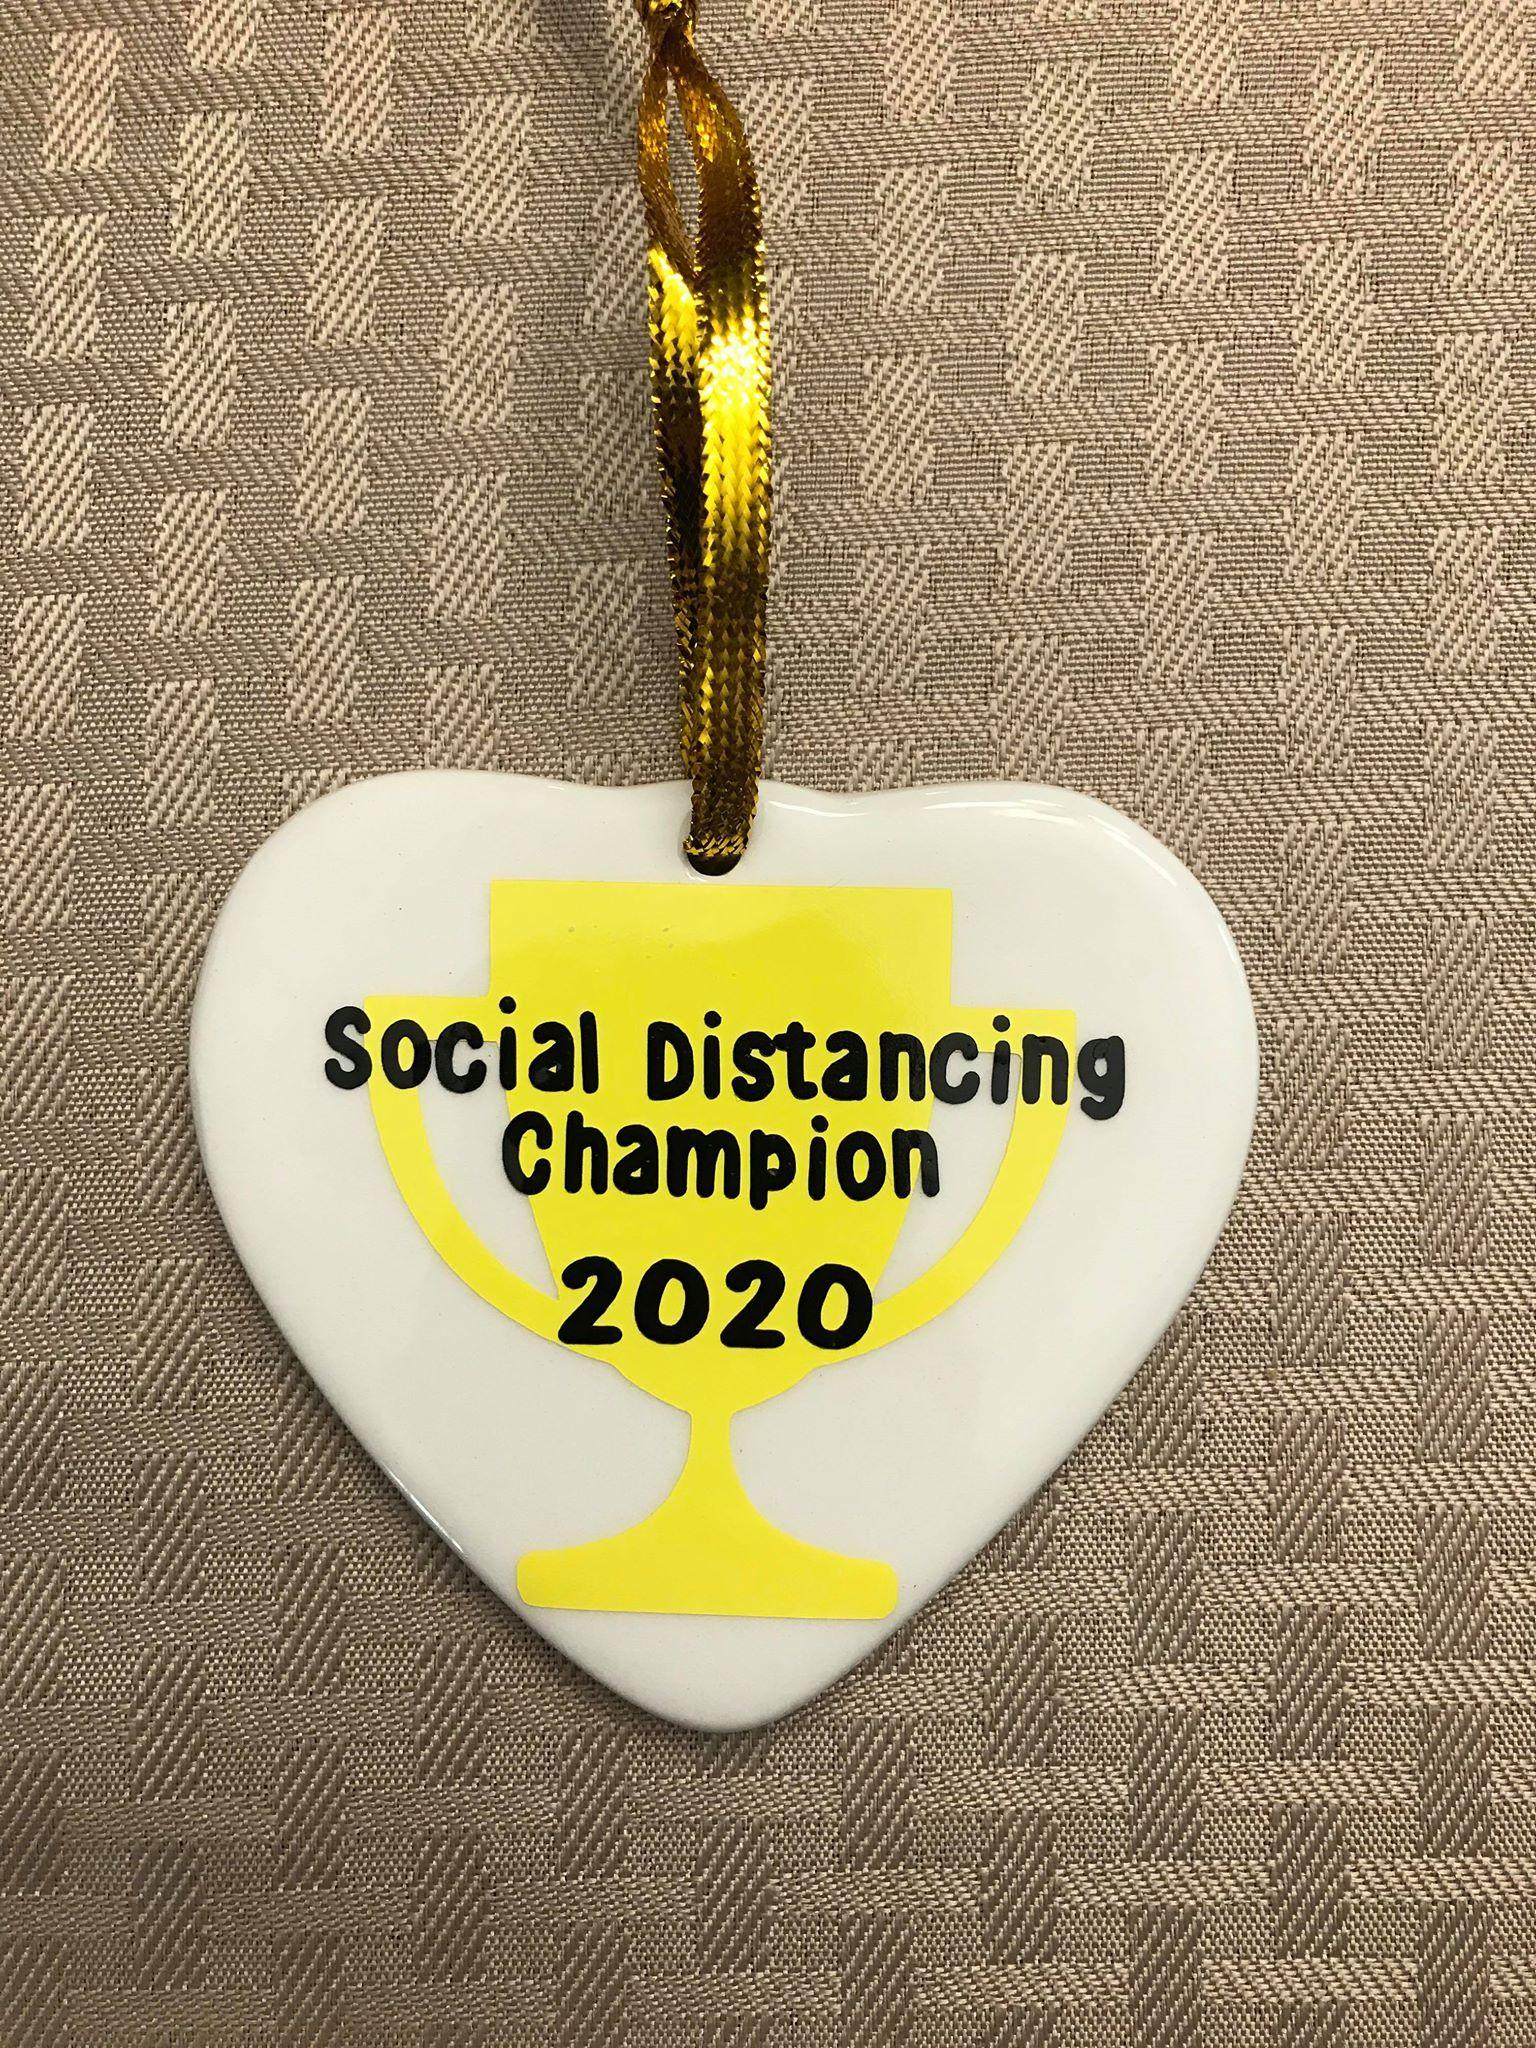 Social Distancing Champion Christmas Ornament In 2020 Wood Christmas Ornaments Christmas Ornaments Family Christmas Gifts